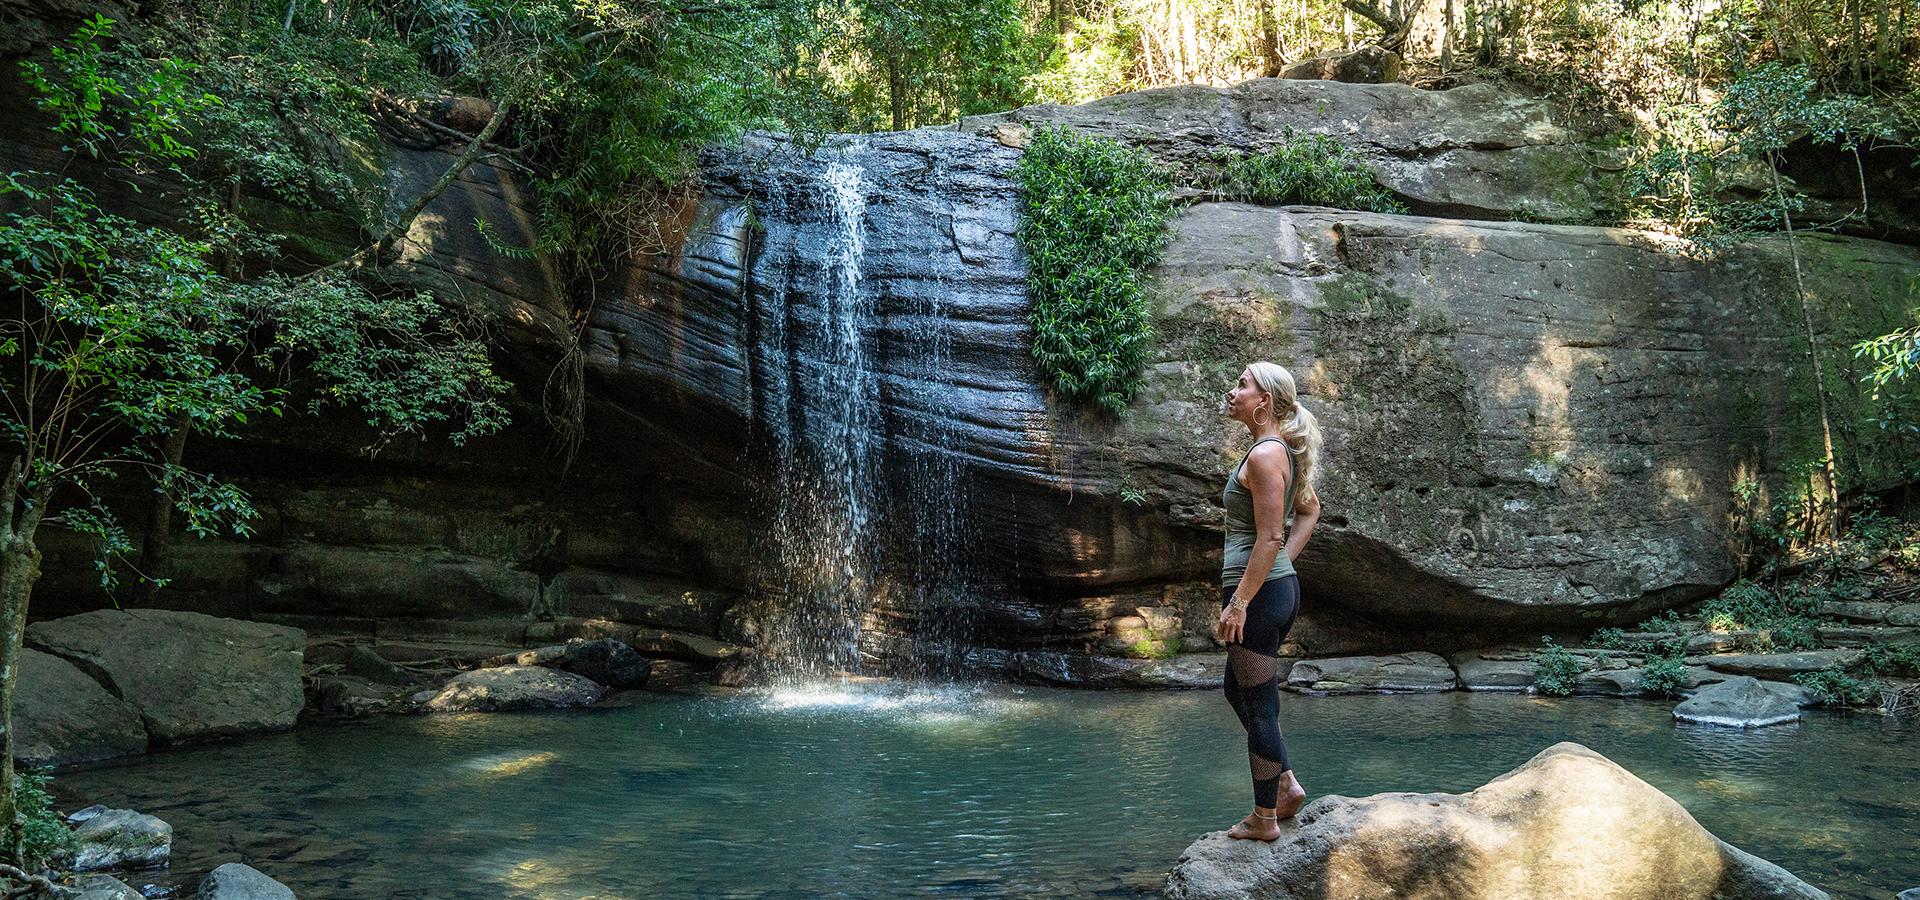 The Sunshine Coast's undiscovered waterfalls